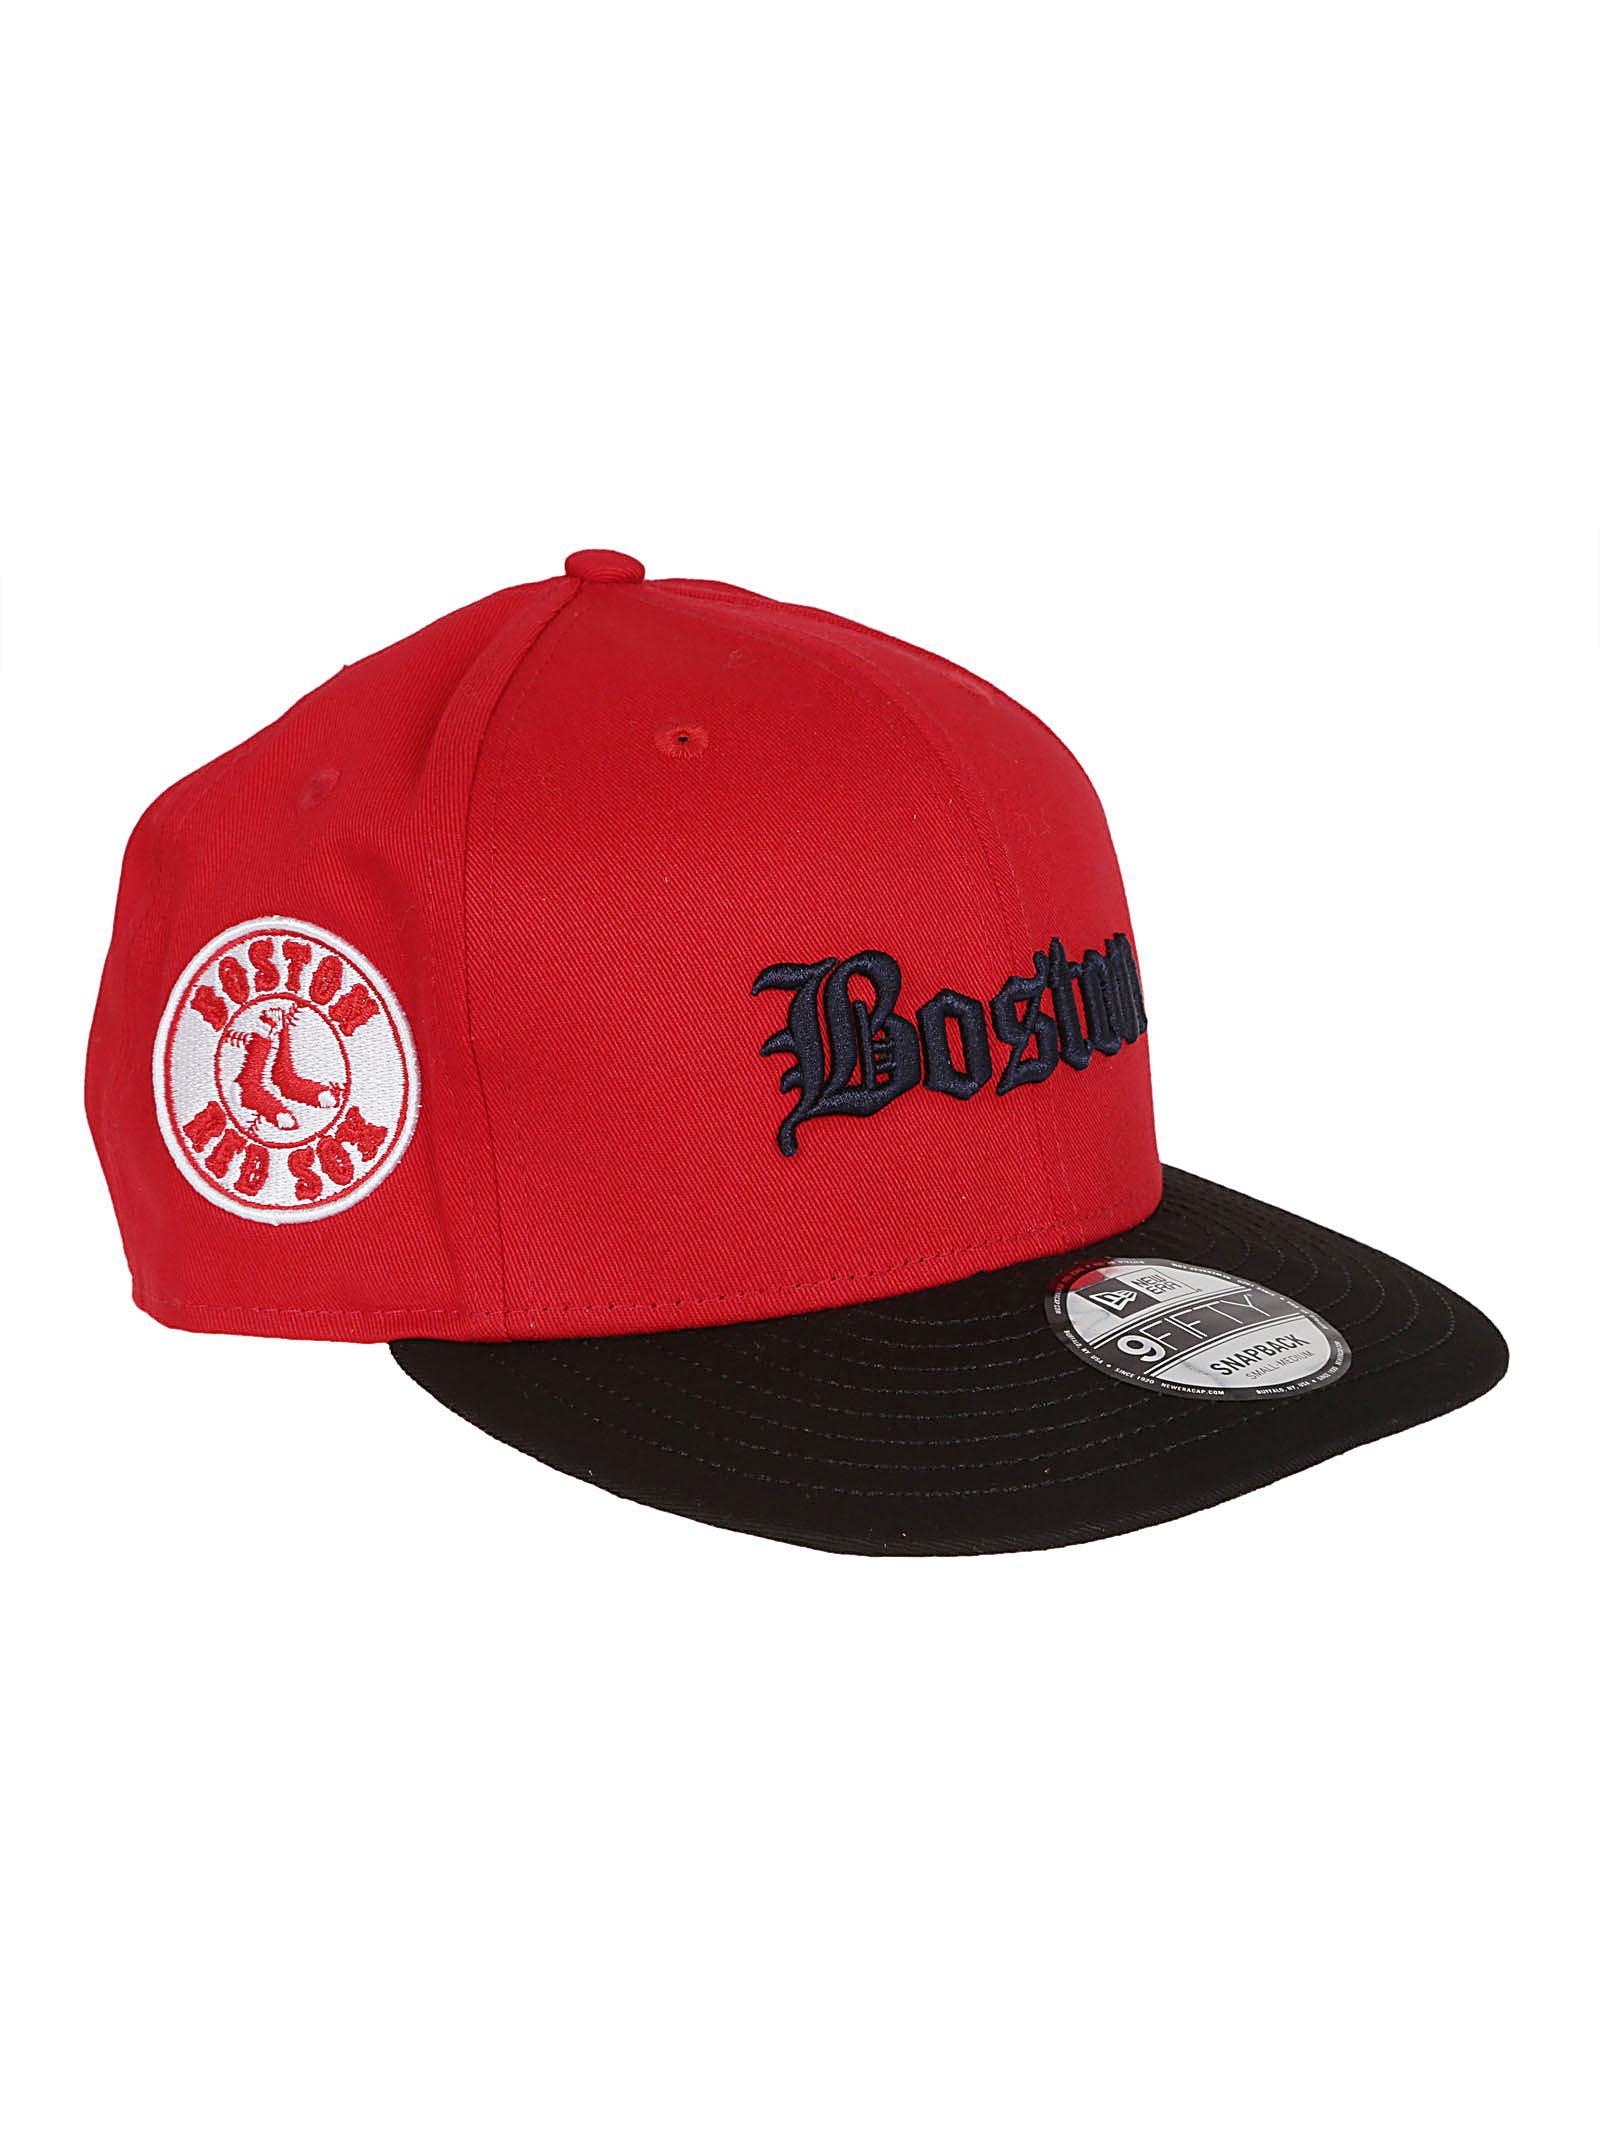 0c9ca05f57ca8a Lyst - Marcelo Burlon Ne Red Sox Cap Red Black in Red for Men